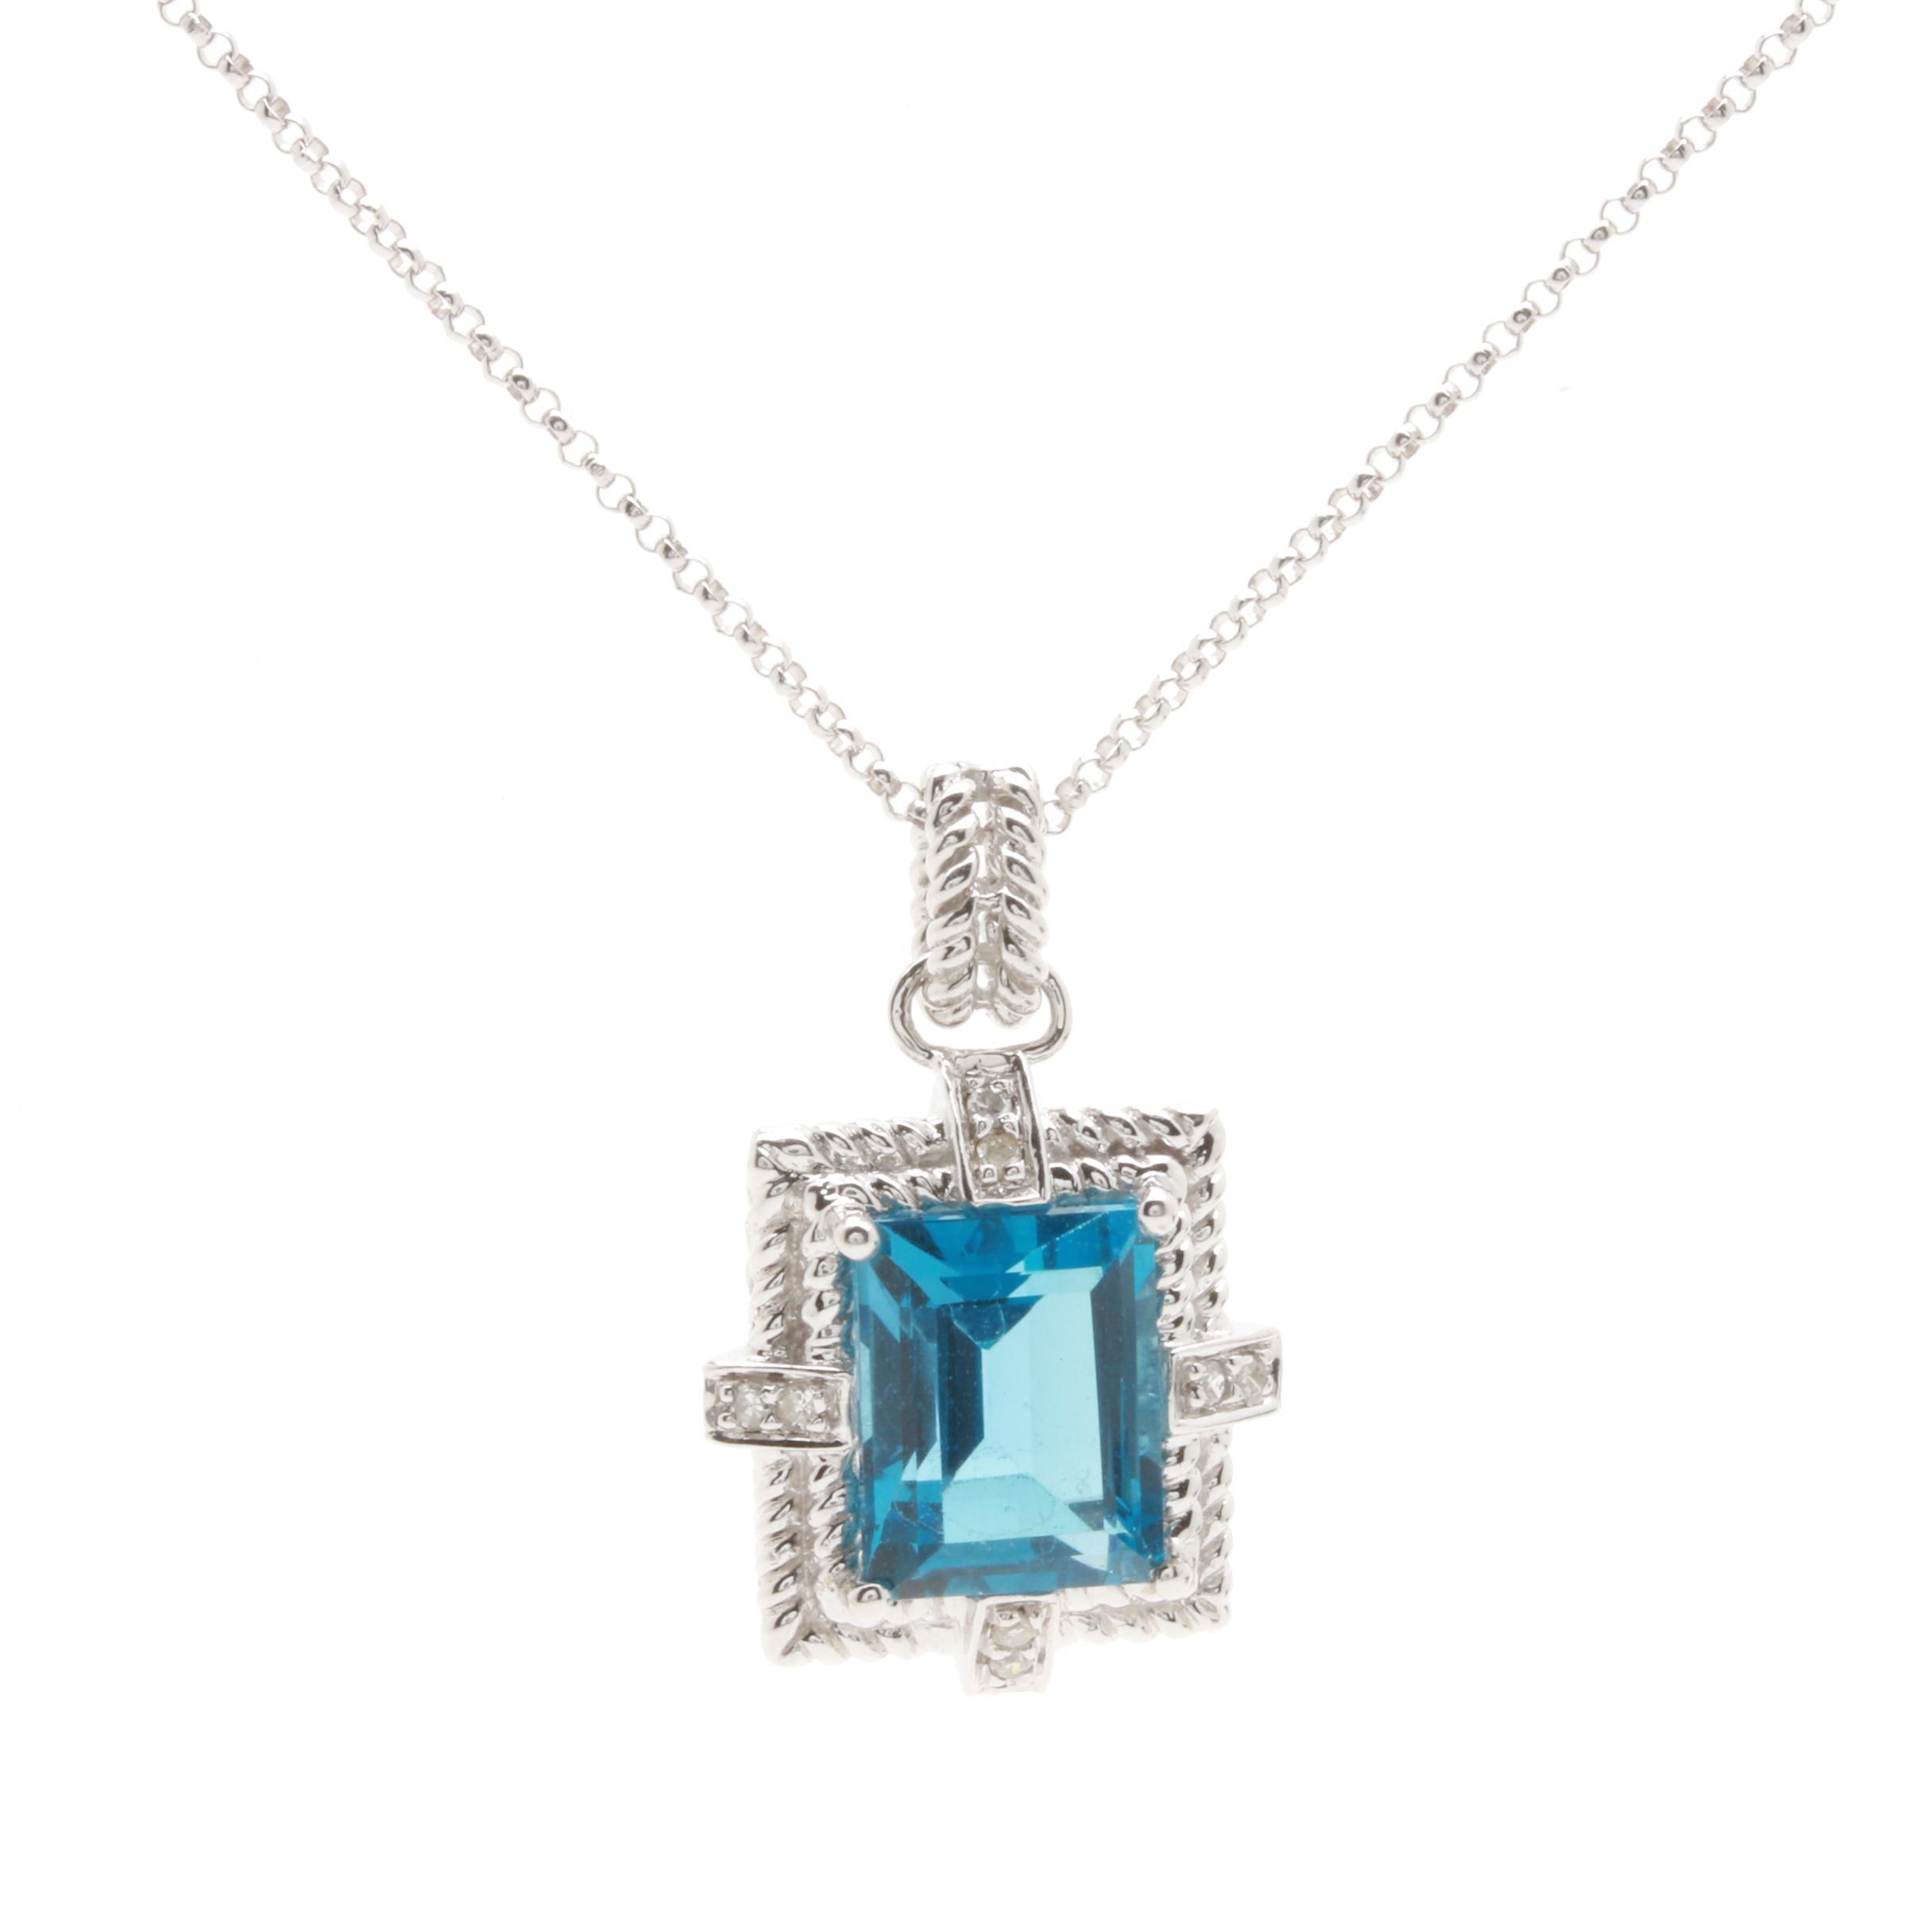 14K White Gold Blue Topaz and Diamond Pendant Necklace